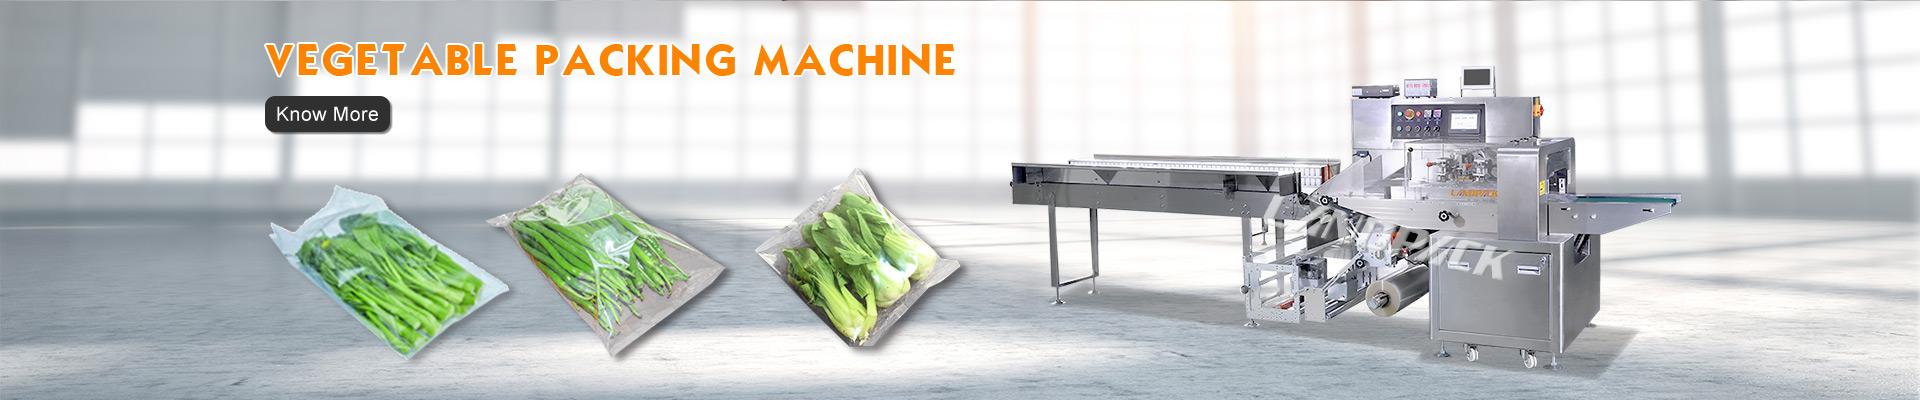 Vegetable Packing Machine